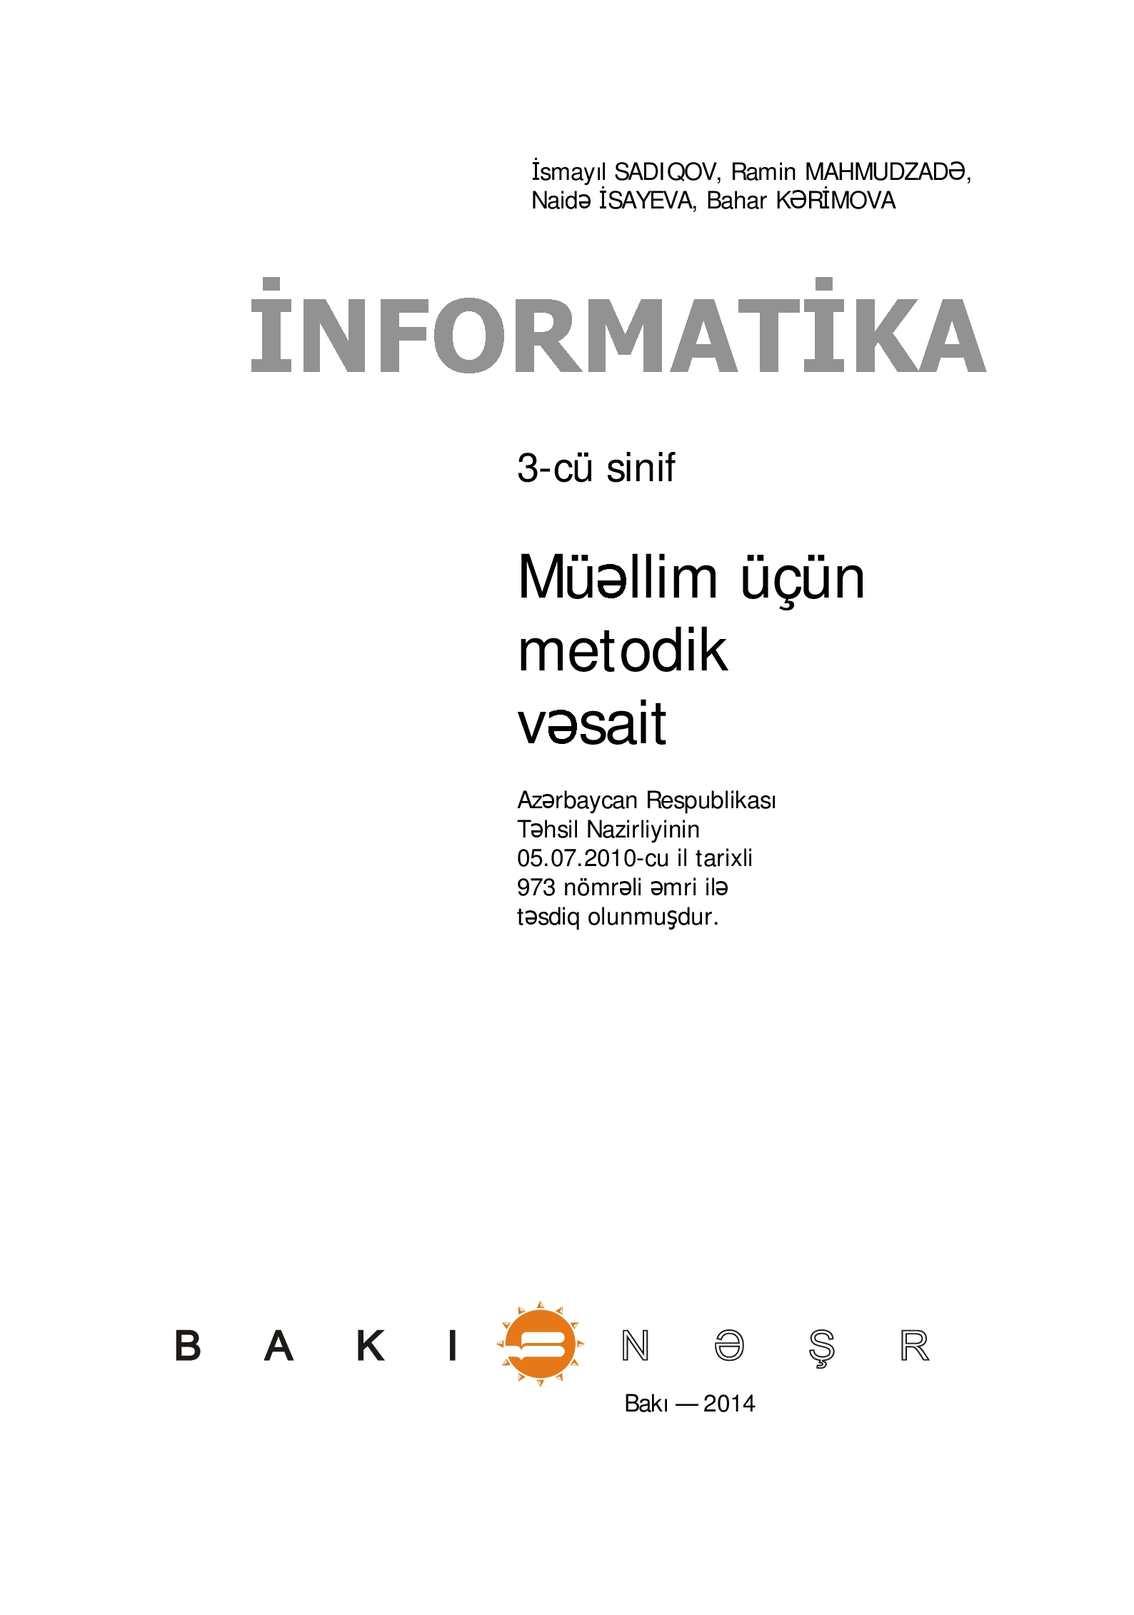 Calameo 3 Cu Sinif Informatika Muәllim Ucun Metodik Vәsait 2014